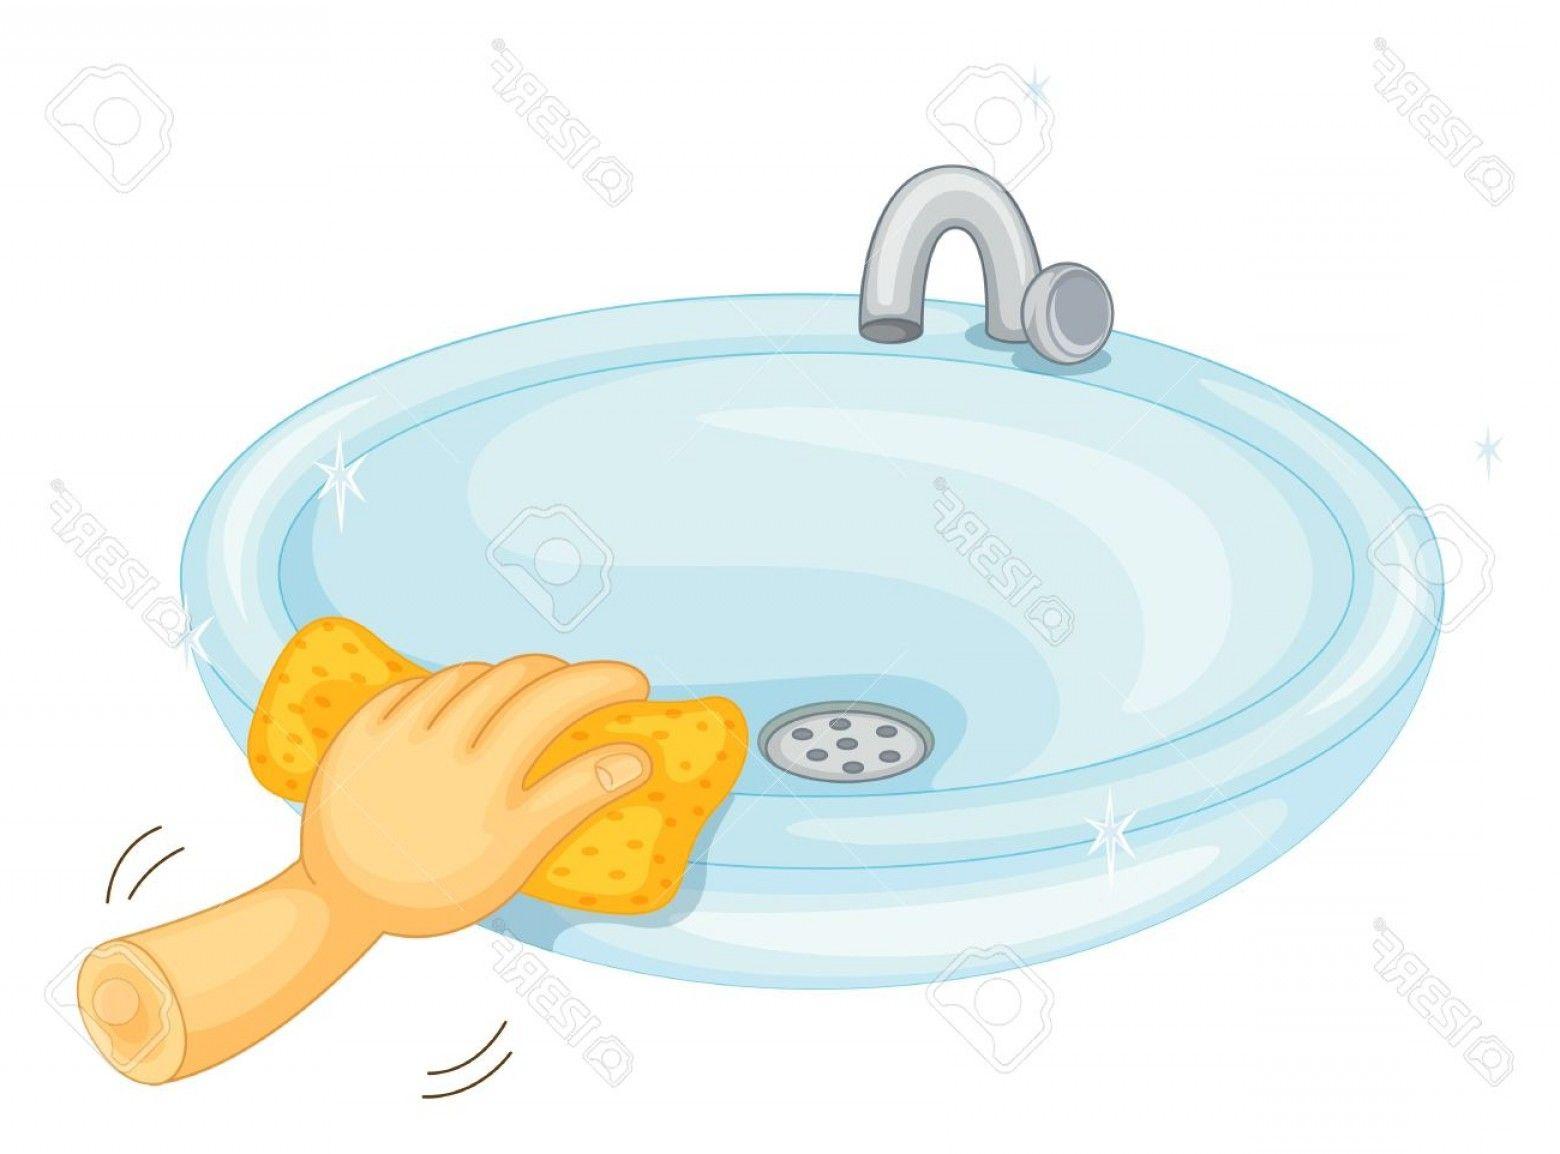 1560x1154 Clean Bathroom Clip Art Home Design Ideas Amazing Simple And Clean